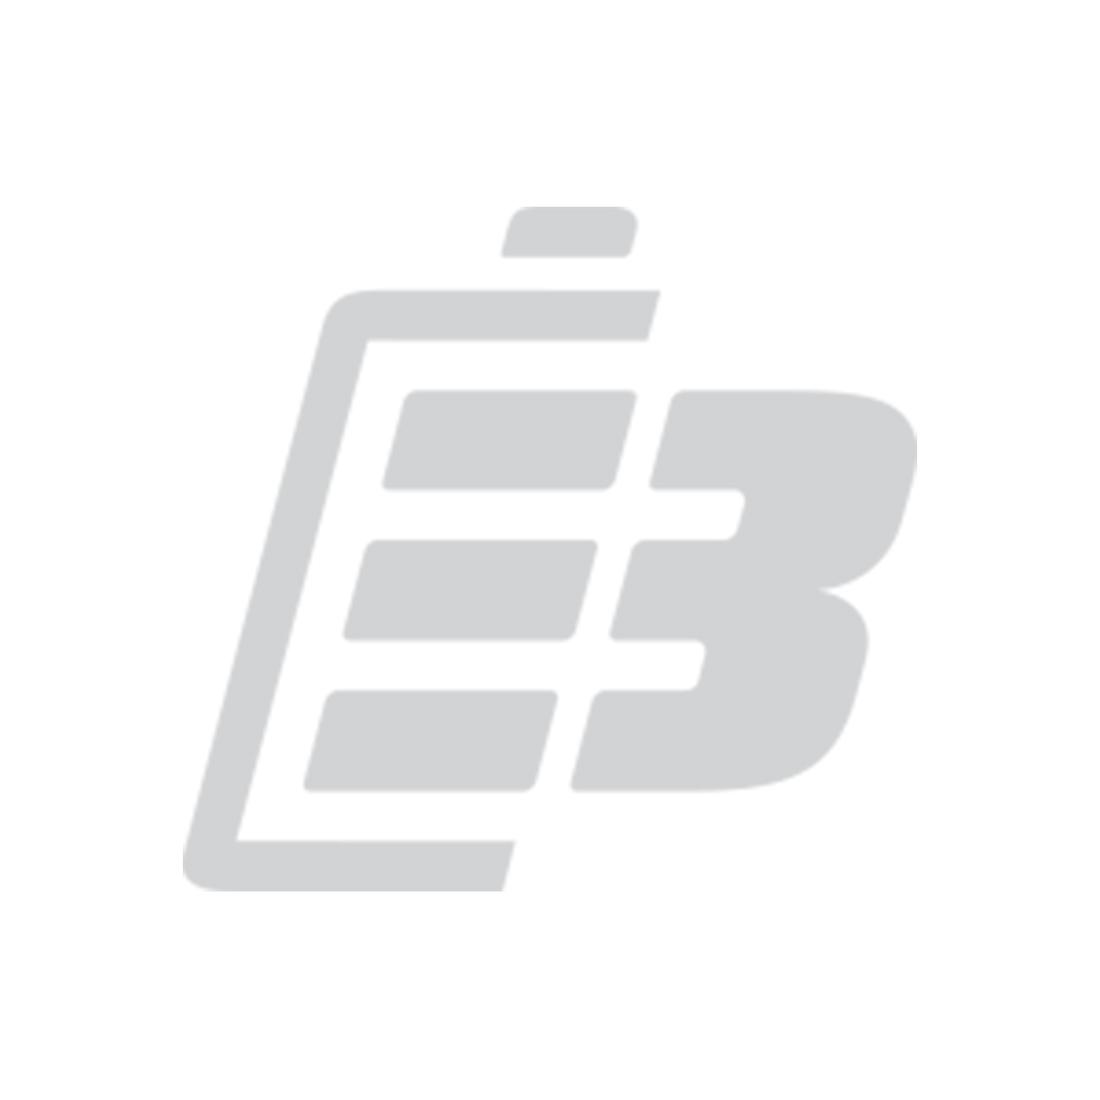 Two-Way radio battery Icom BP-230_1